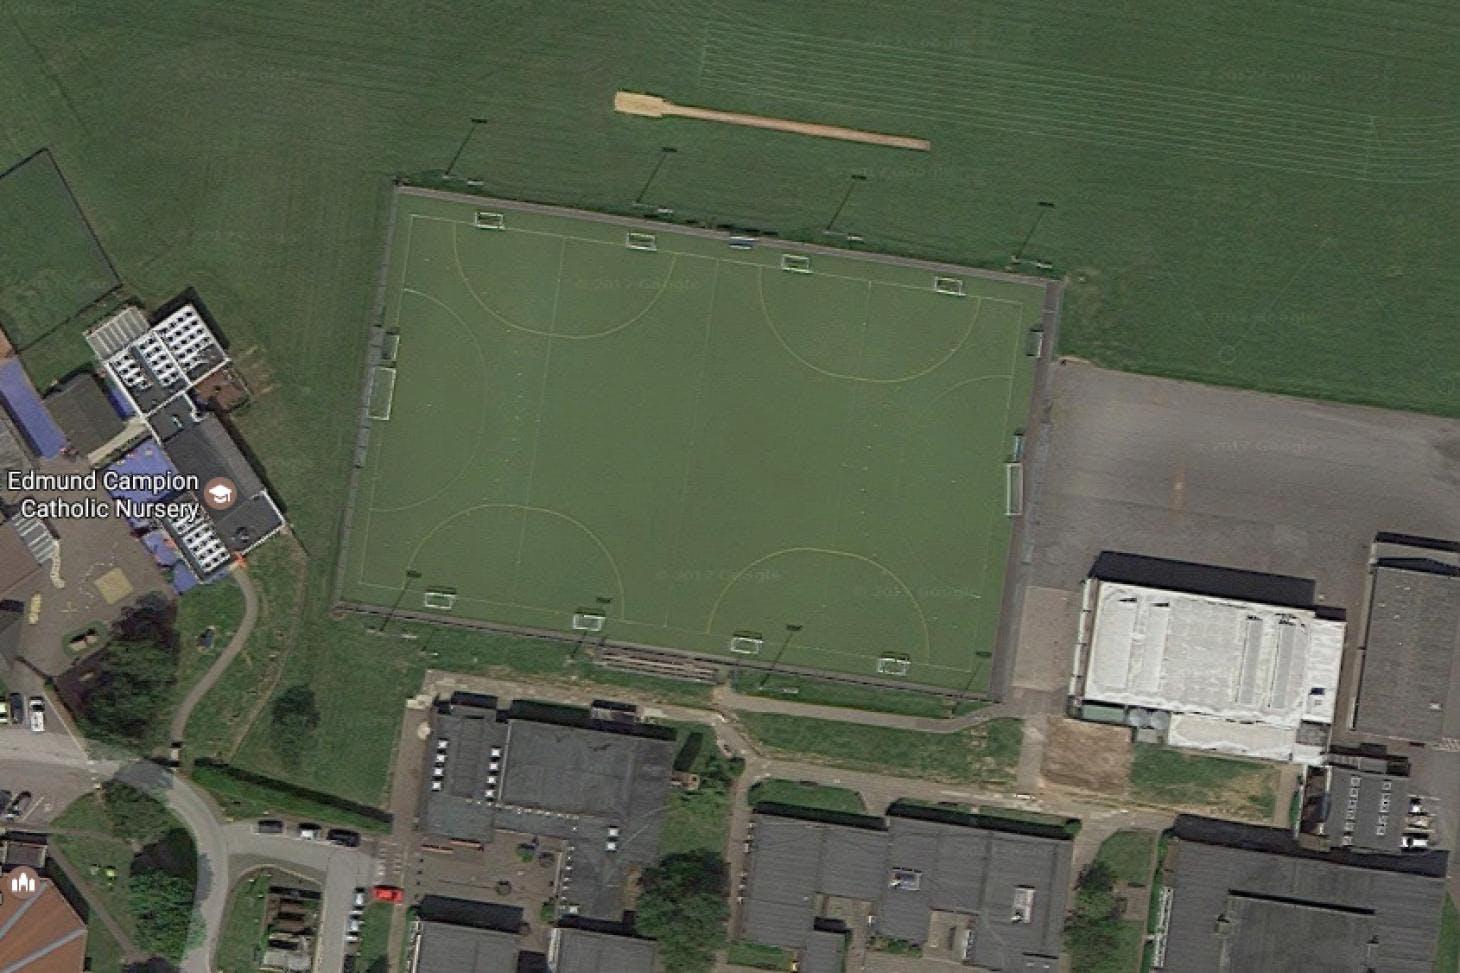 Altwood Church of England School Outdoor | Astroturf hockey pitch